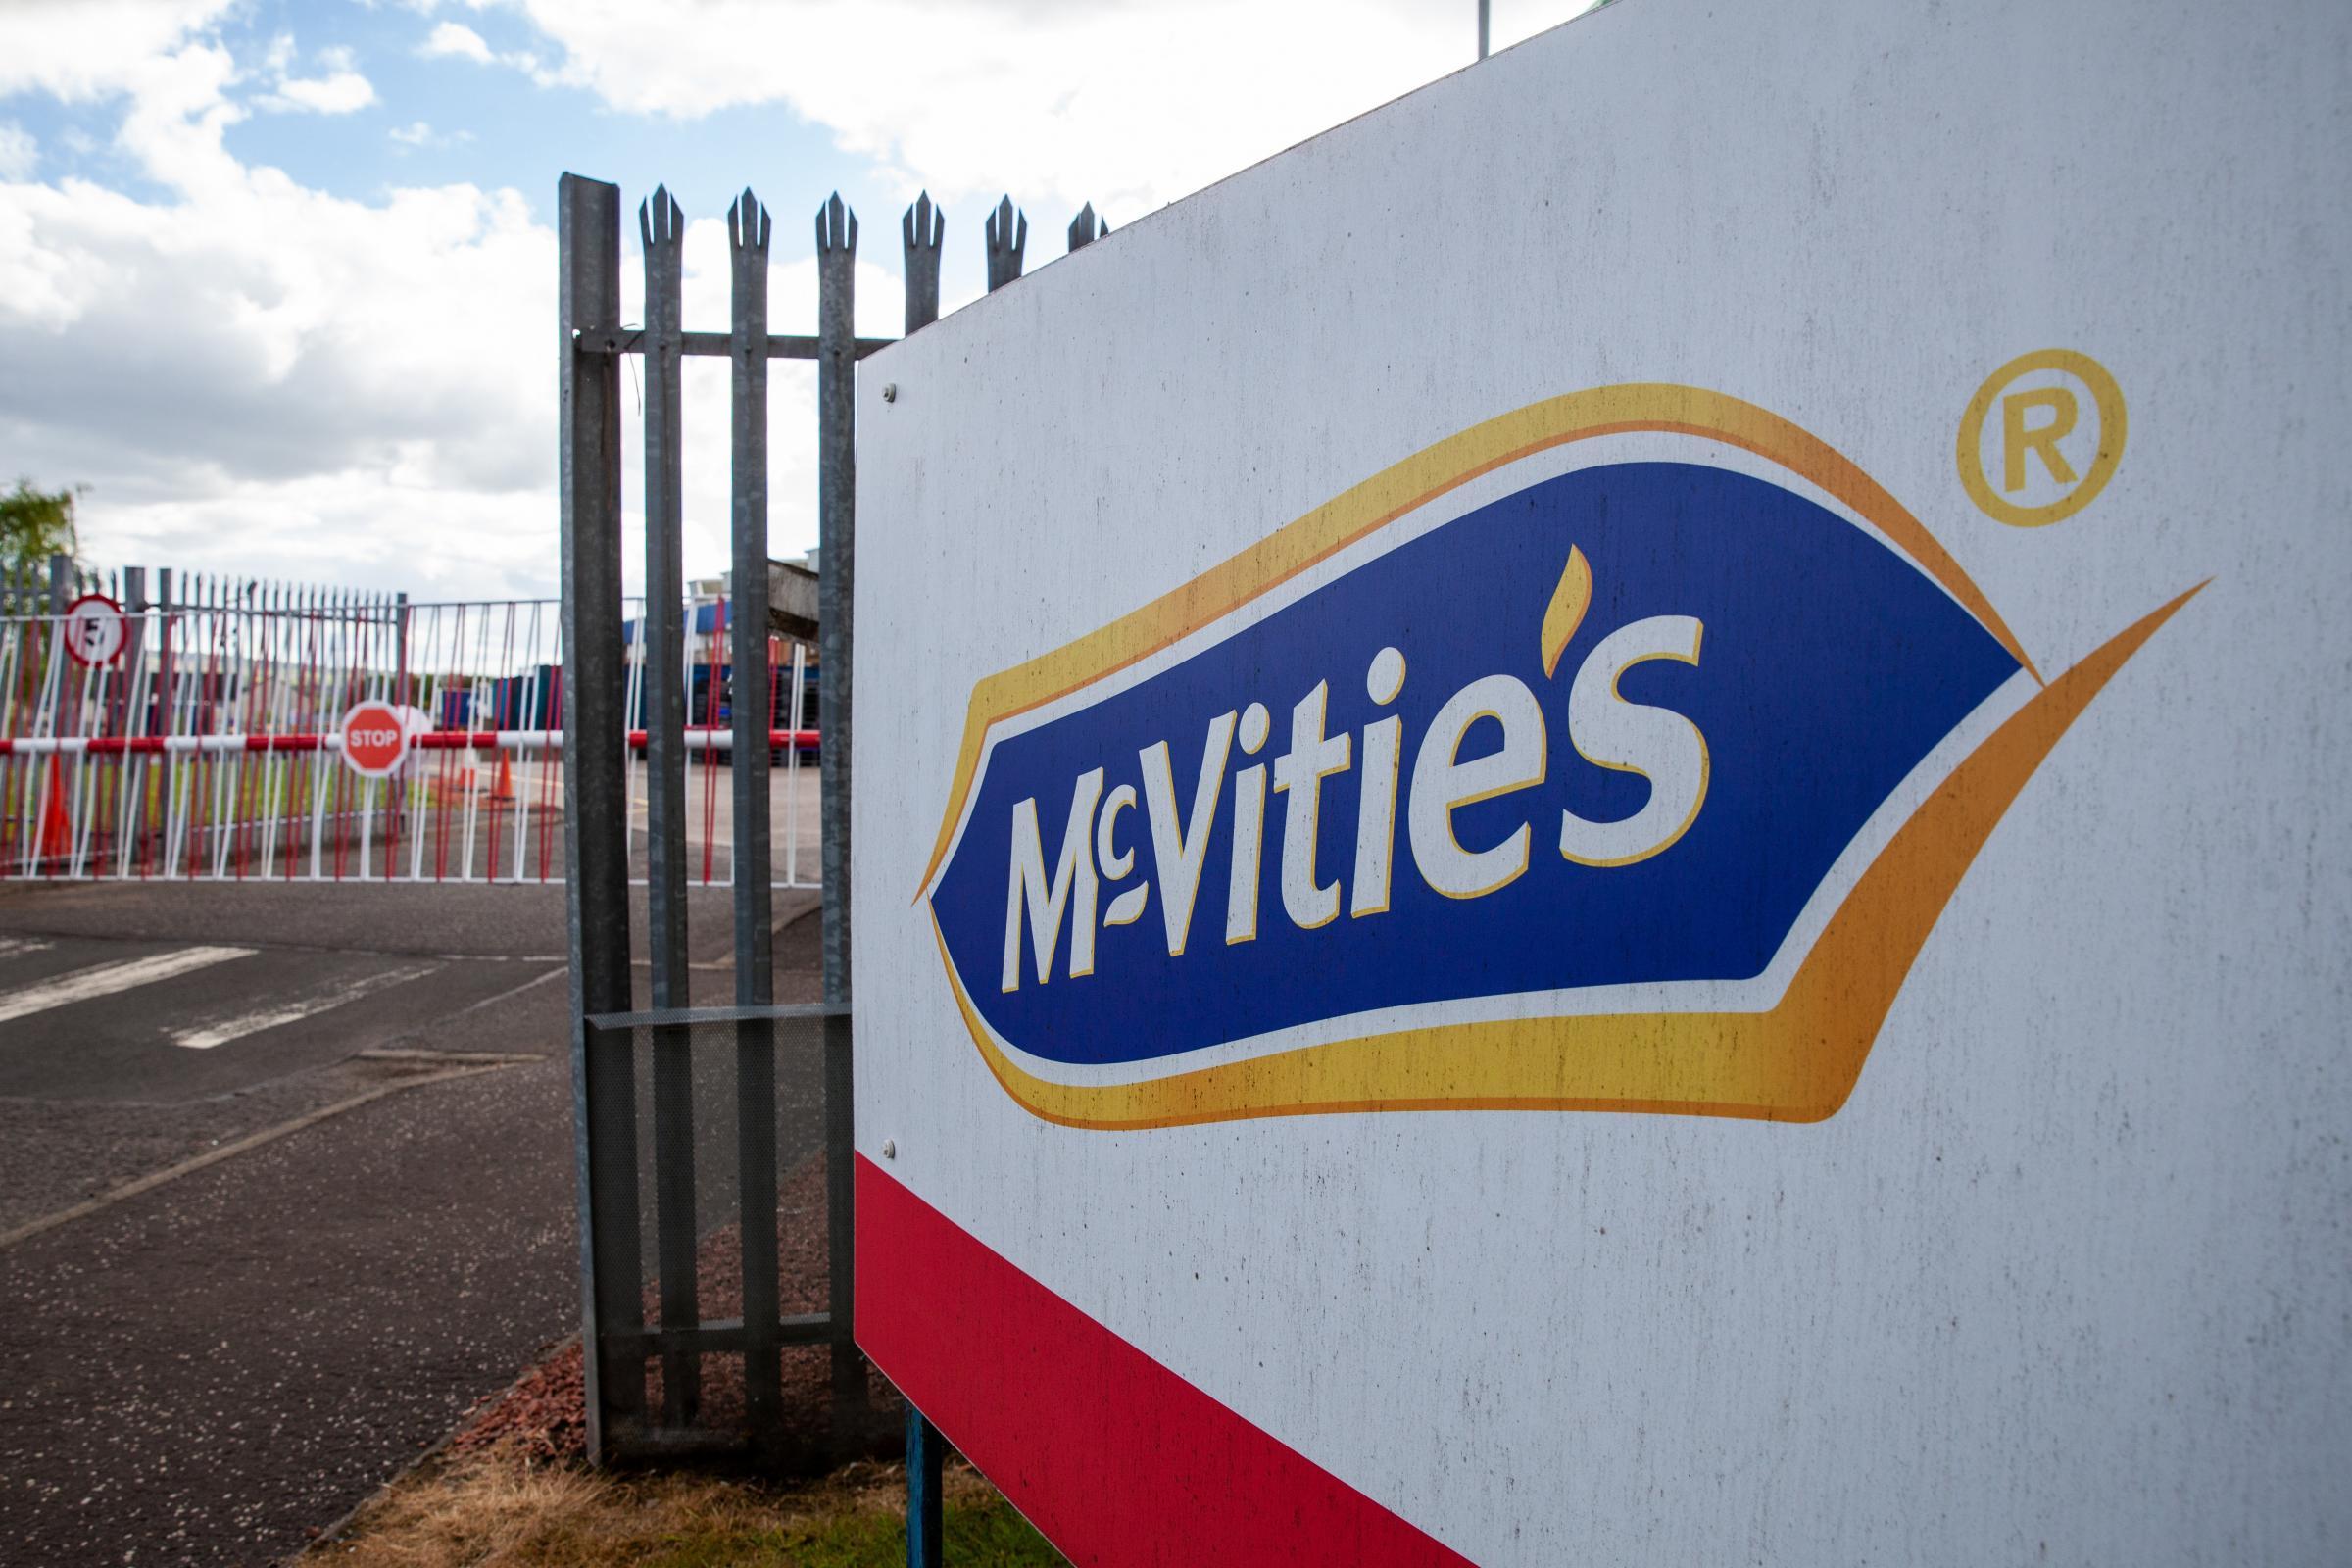 David Linden MP puts pressure on UK Government over McVitie's Tollcross closure